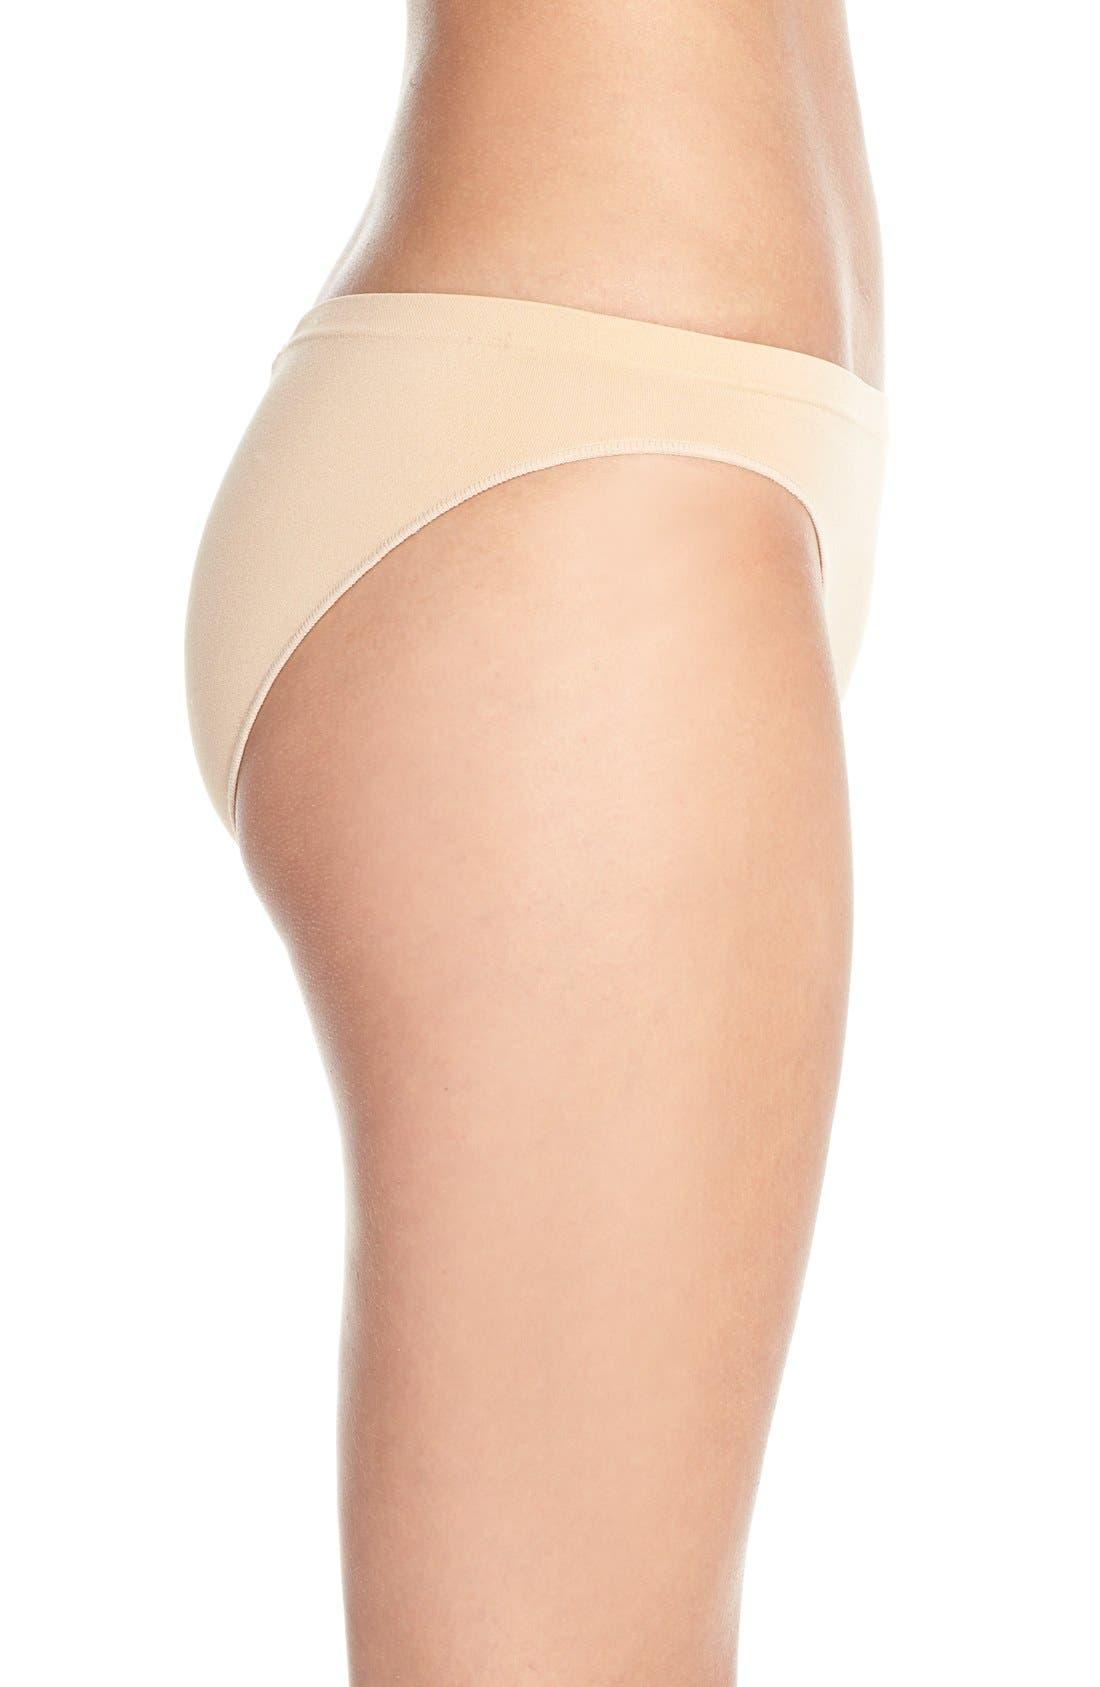 Alternate Image 3  - Calvin Klein 'Pure' Seamless Bikini (3 for $33)